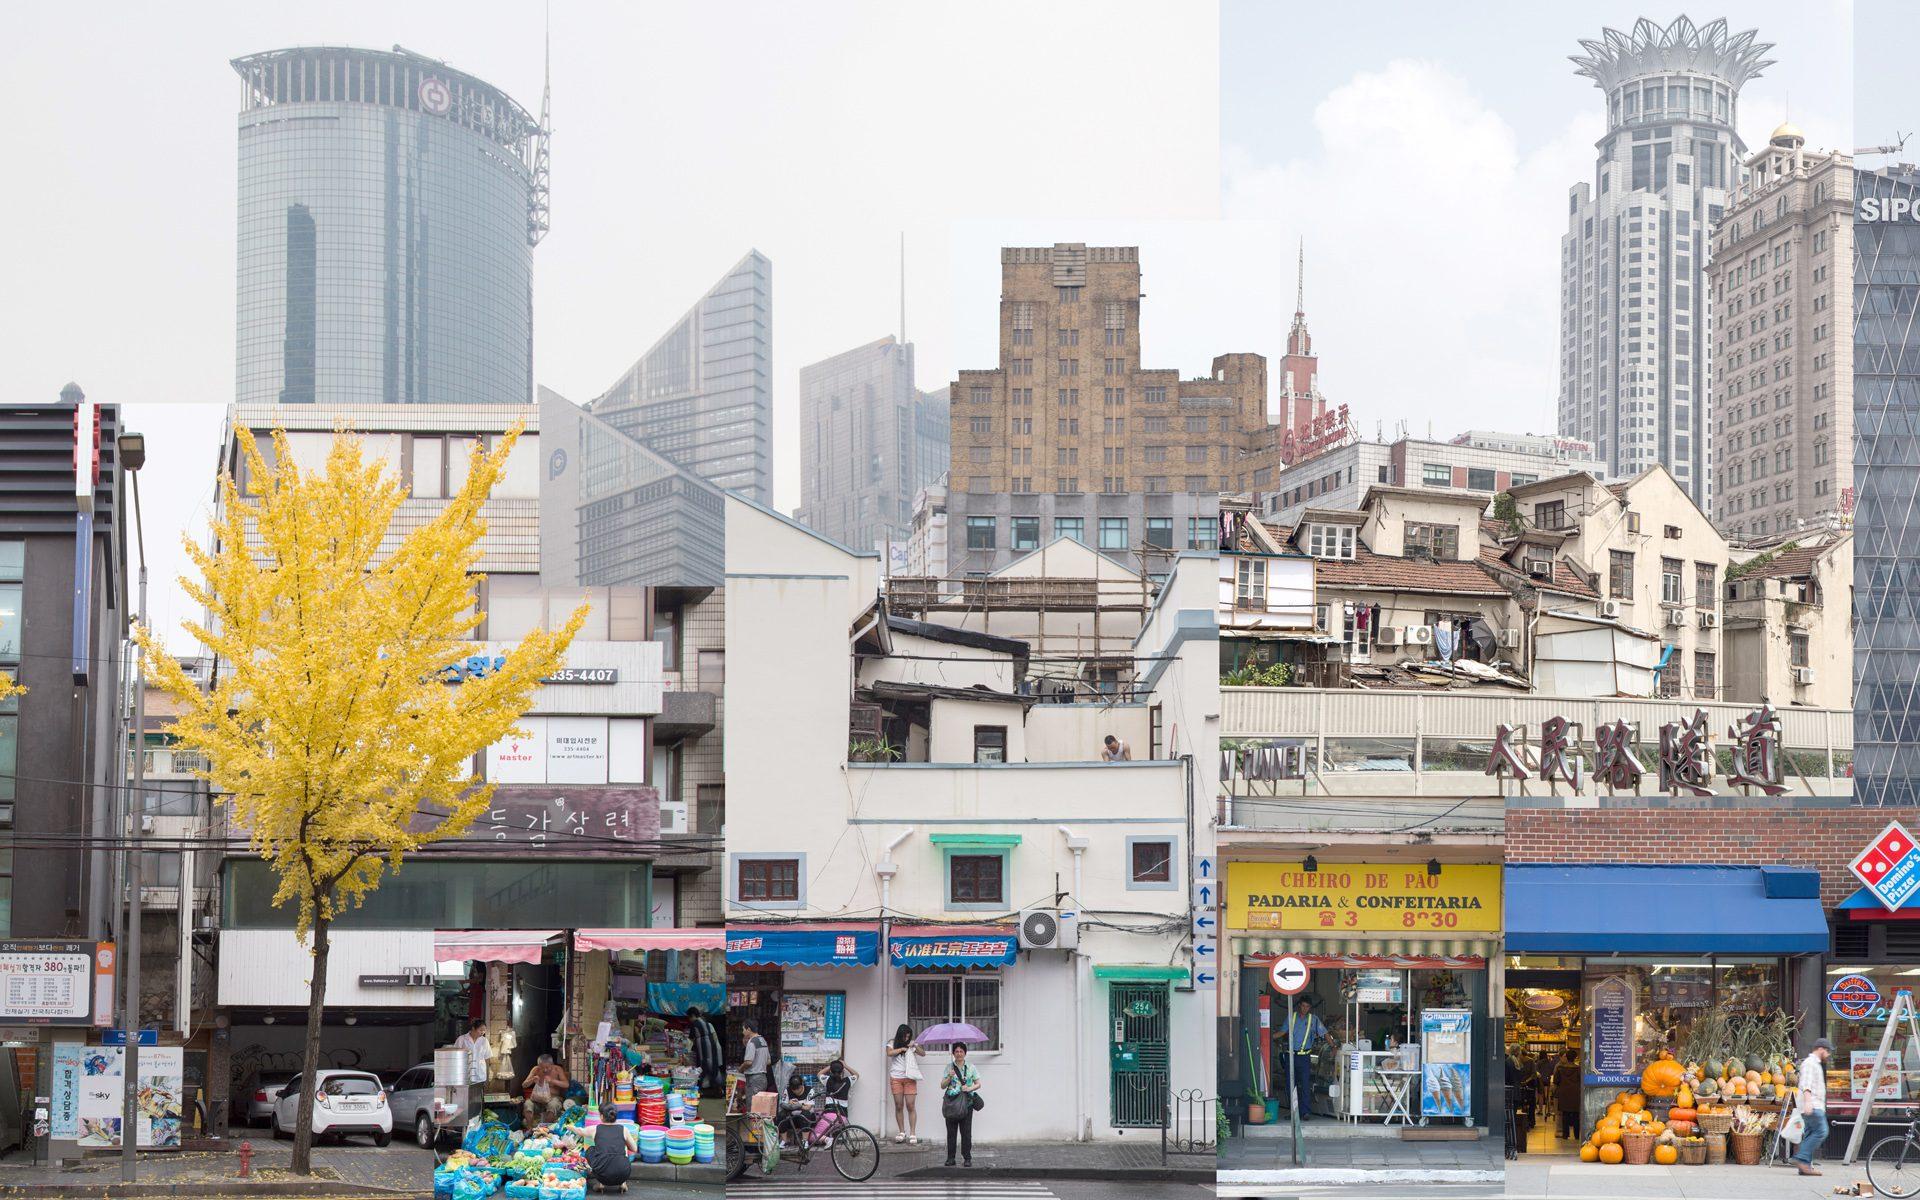 random city 1 - porto alegre - seoul - shanghai